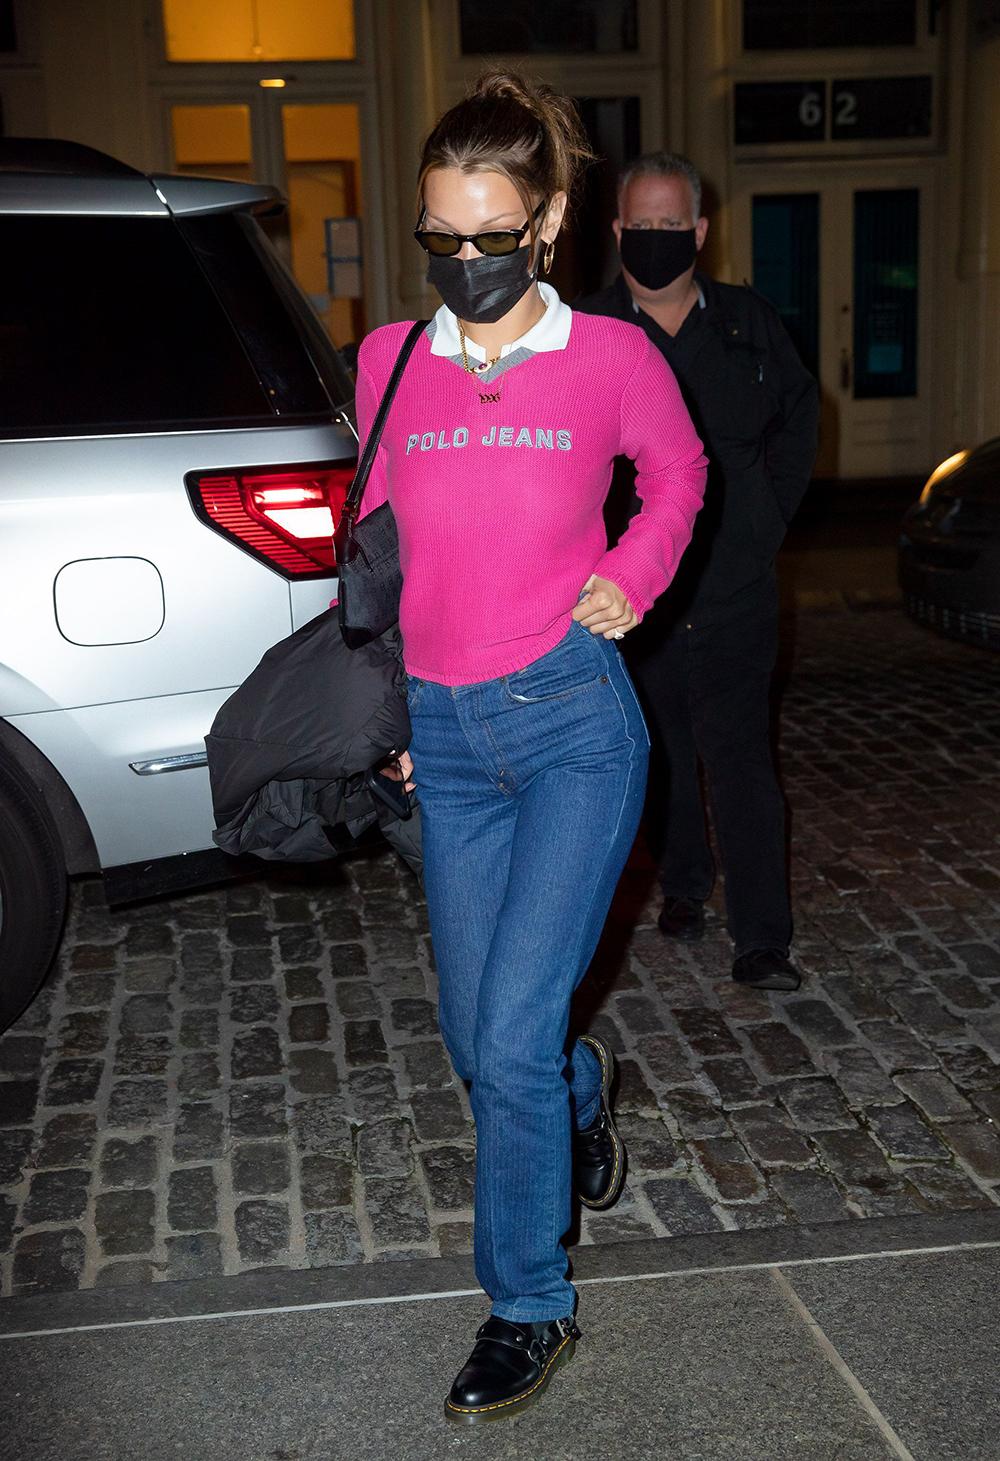 Kan Bella Hadid gjøre comeback for Polo Jeans?